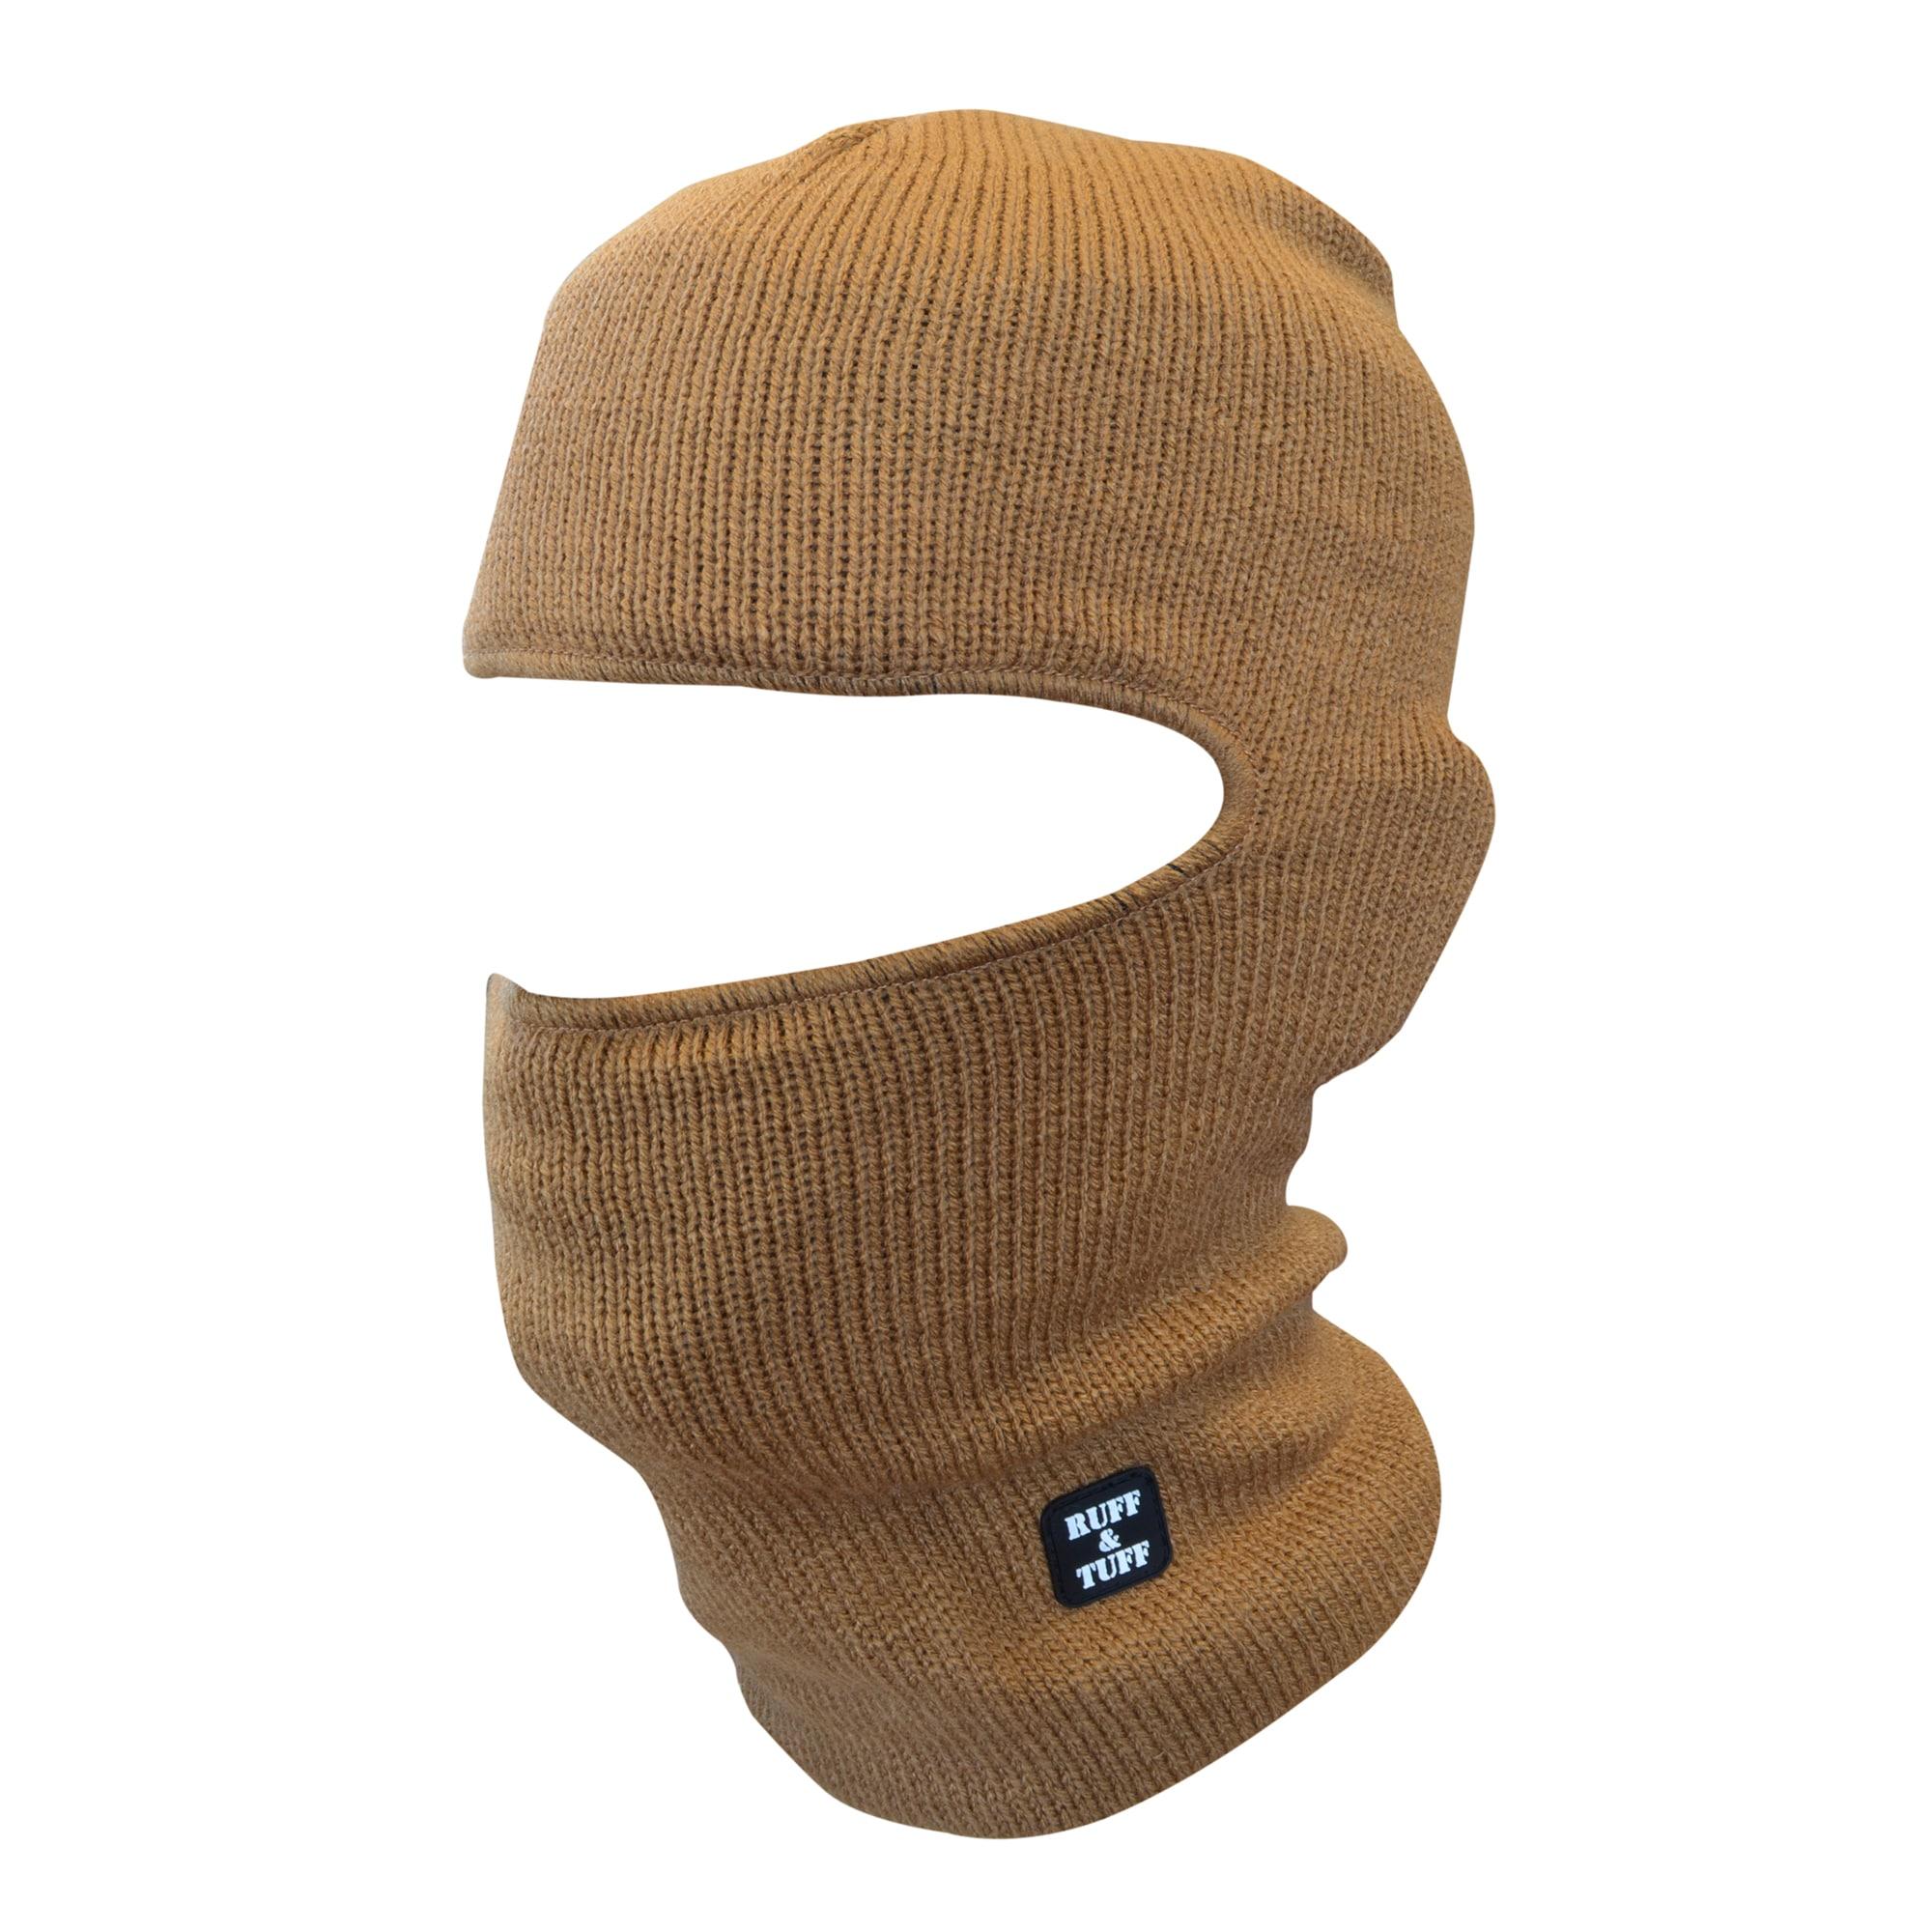 Quiet Wear Ruff & Tuff Cap